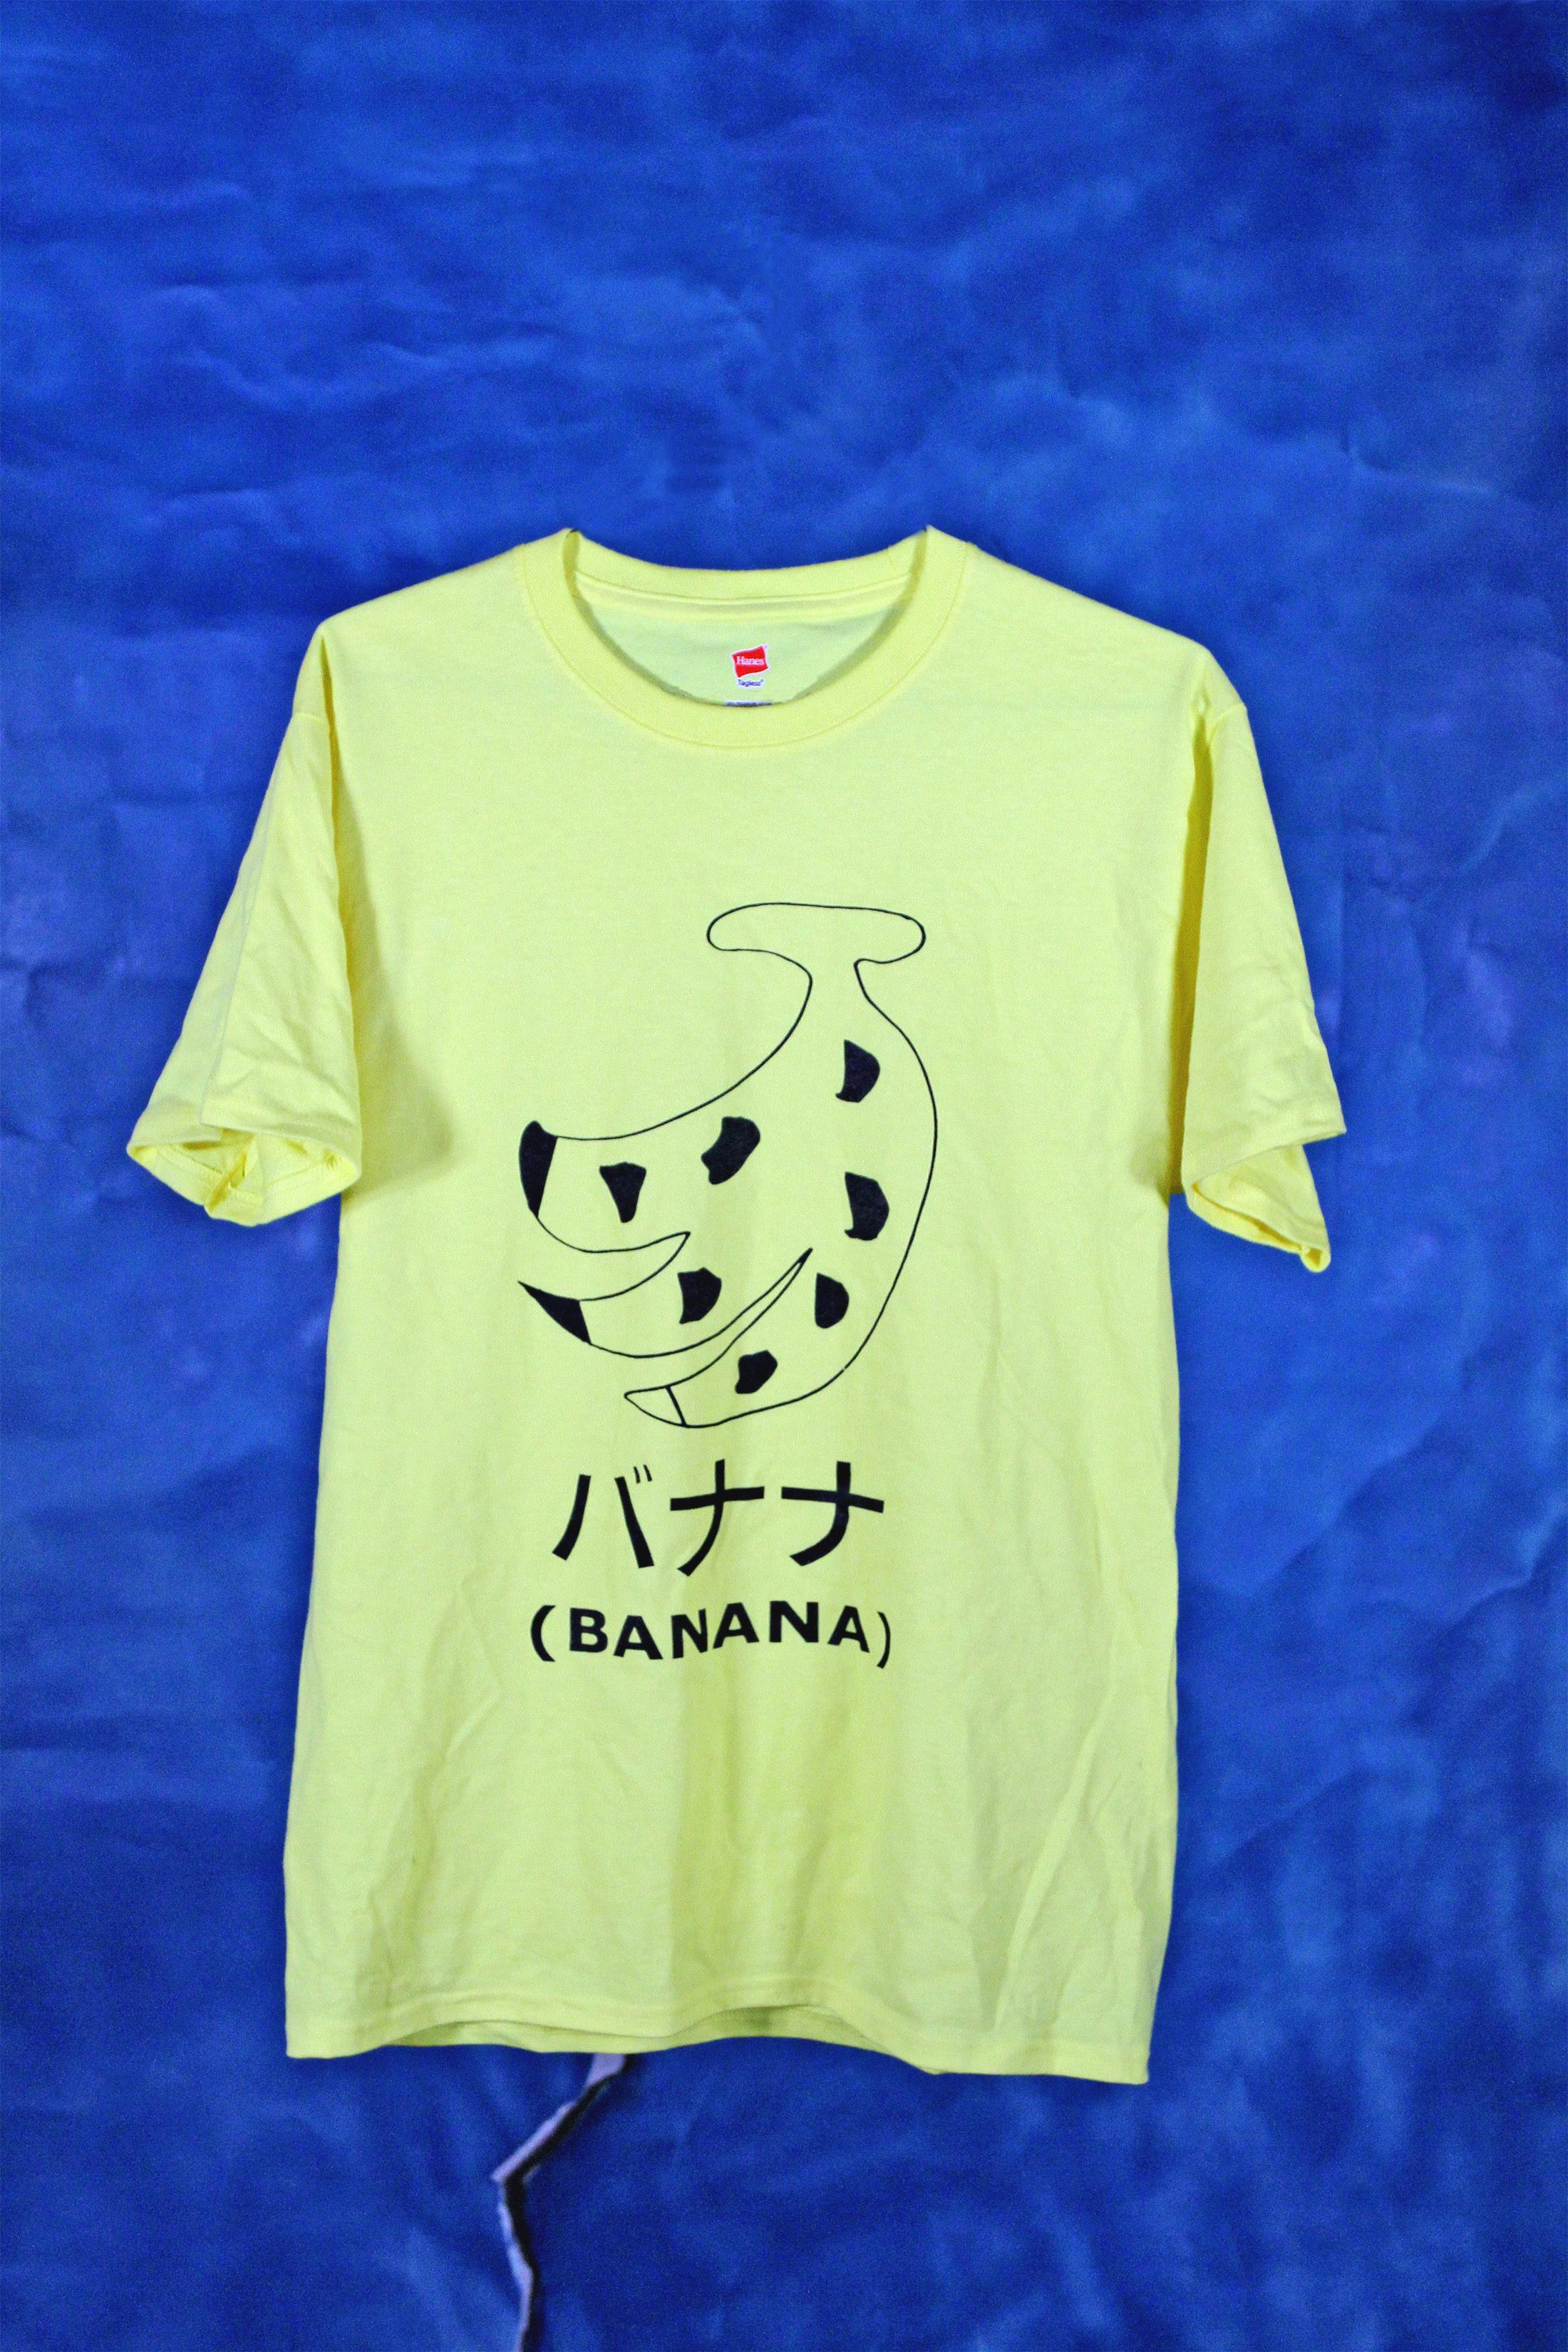 Banana! Tee